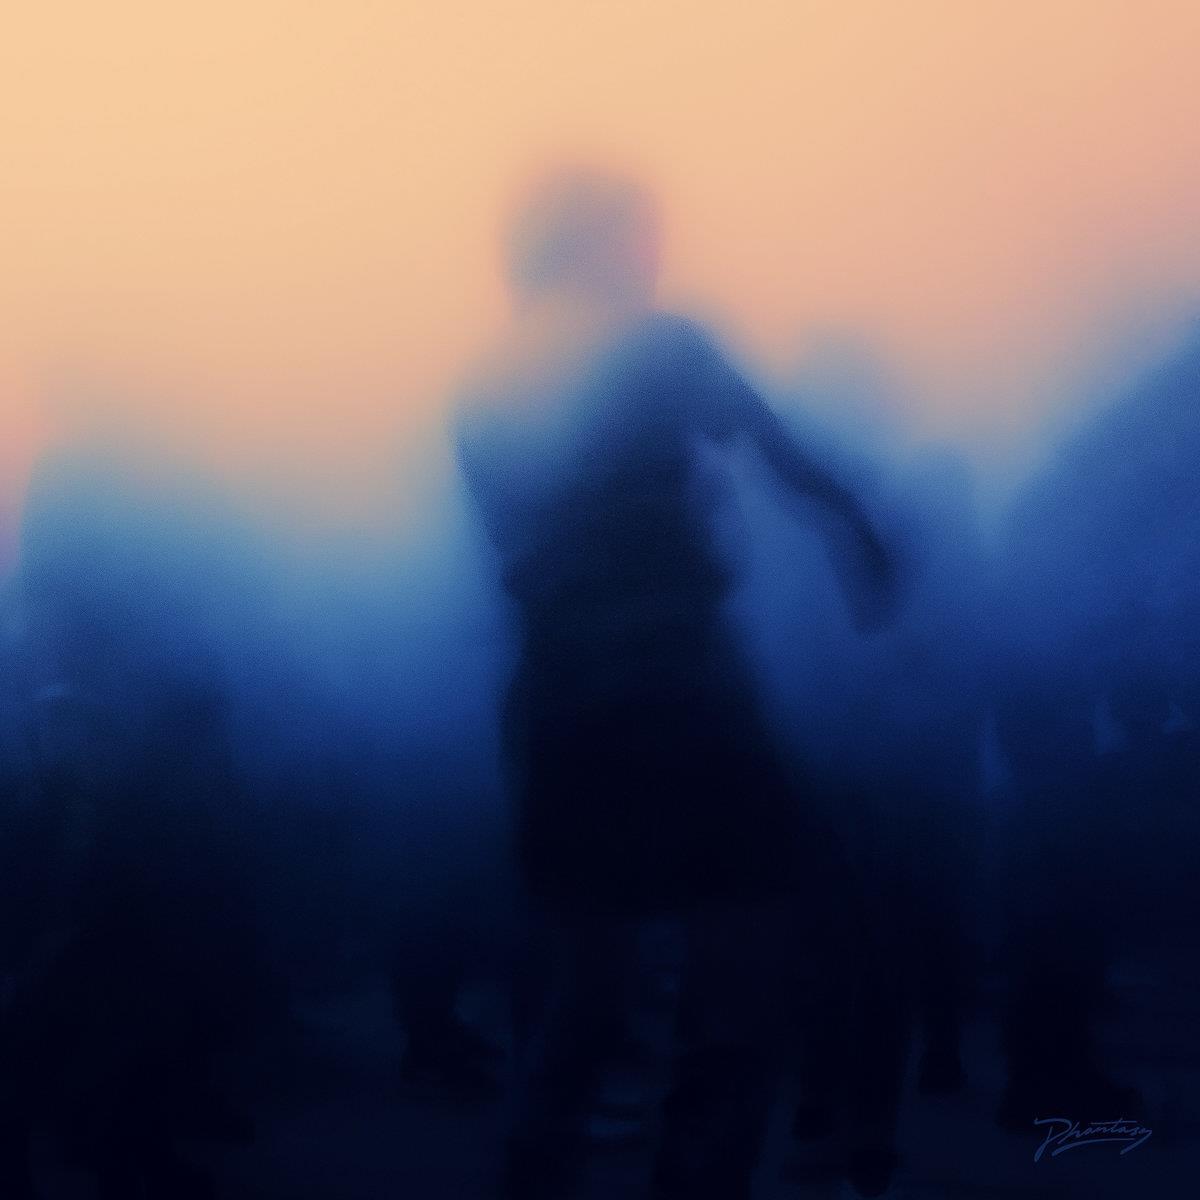 Daniel Avery - Love + Light [LP]